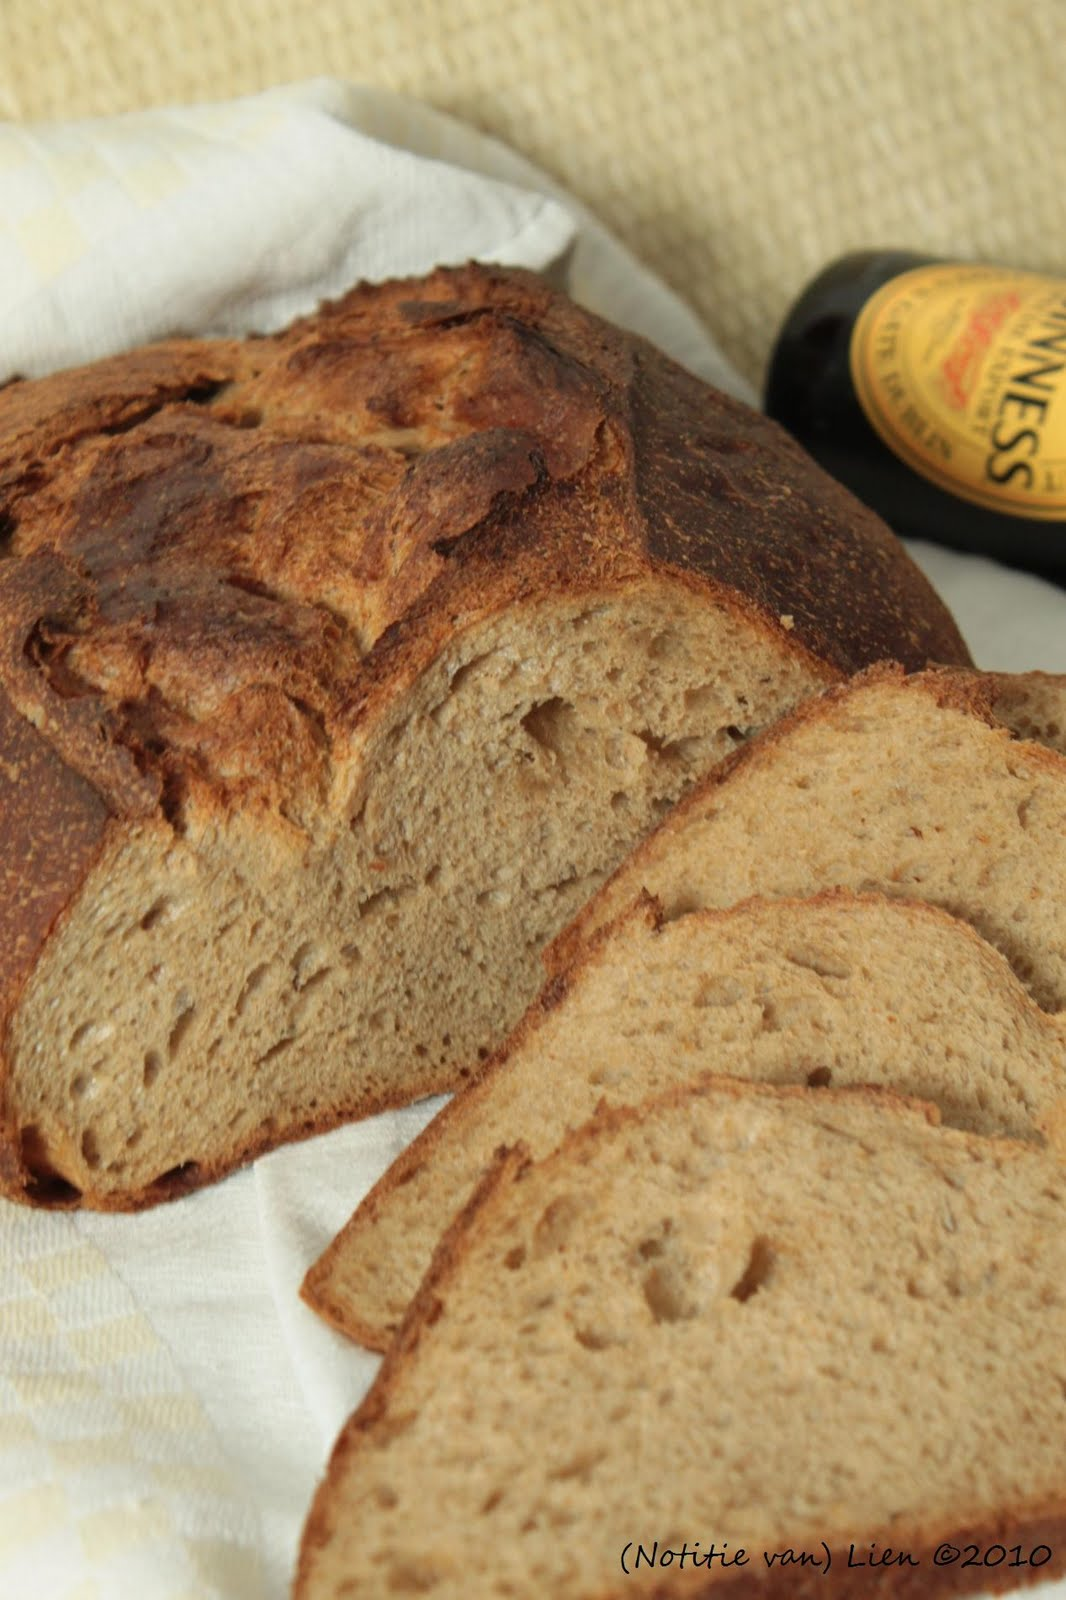 Anise+and+guinness+bread.JPG